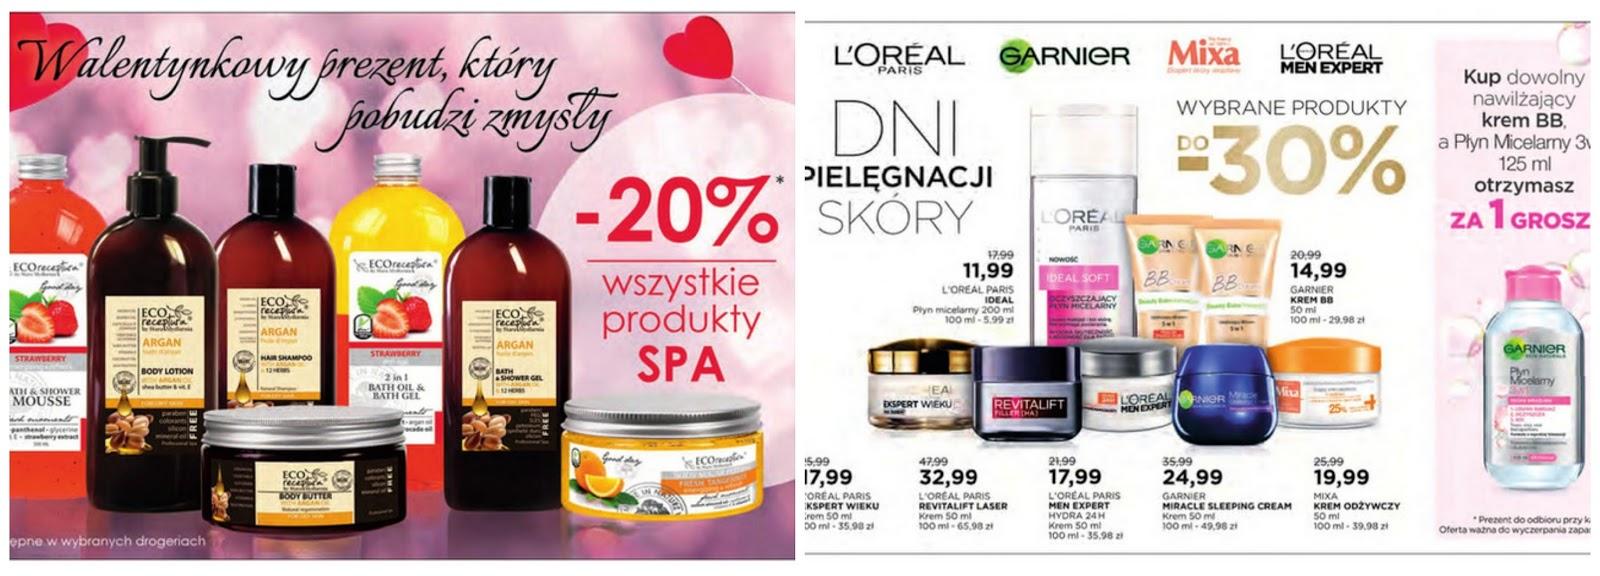 https://drogerie-natura.okazjum.pl/gazetka/gazetka-promocyjna-drogerie-natura-05-02-2016,18615/1/